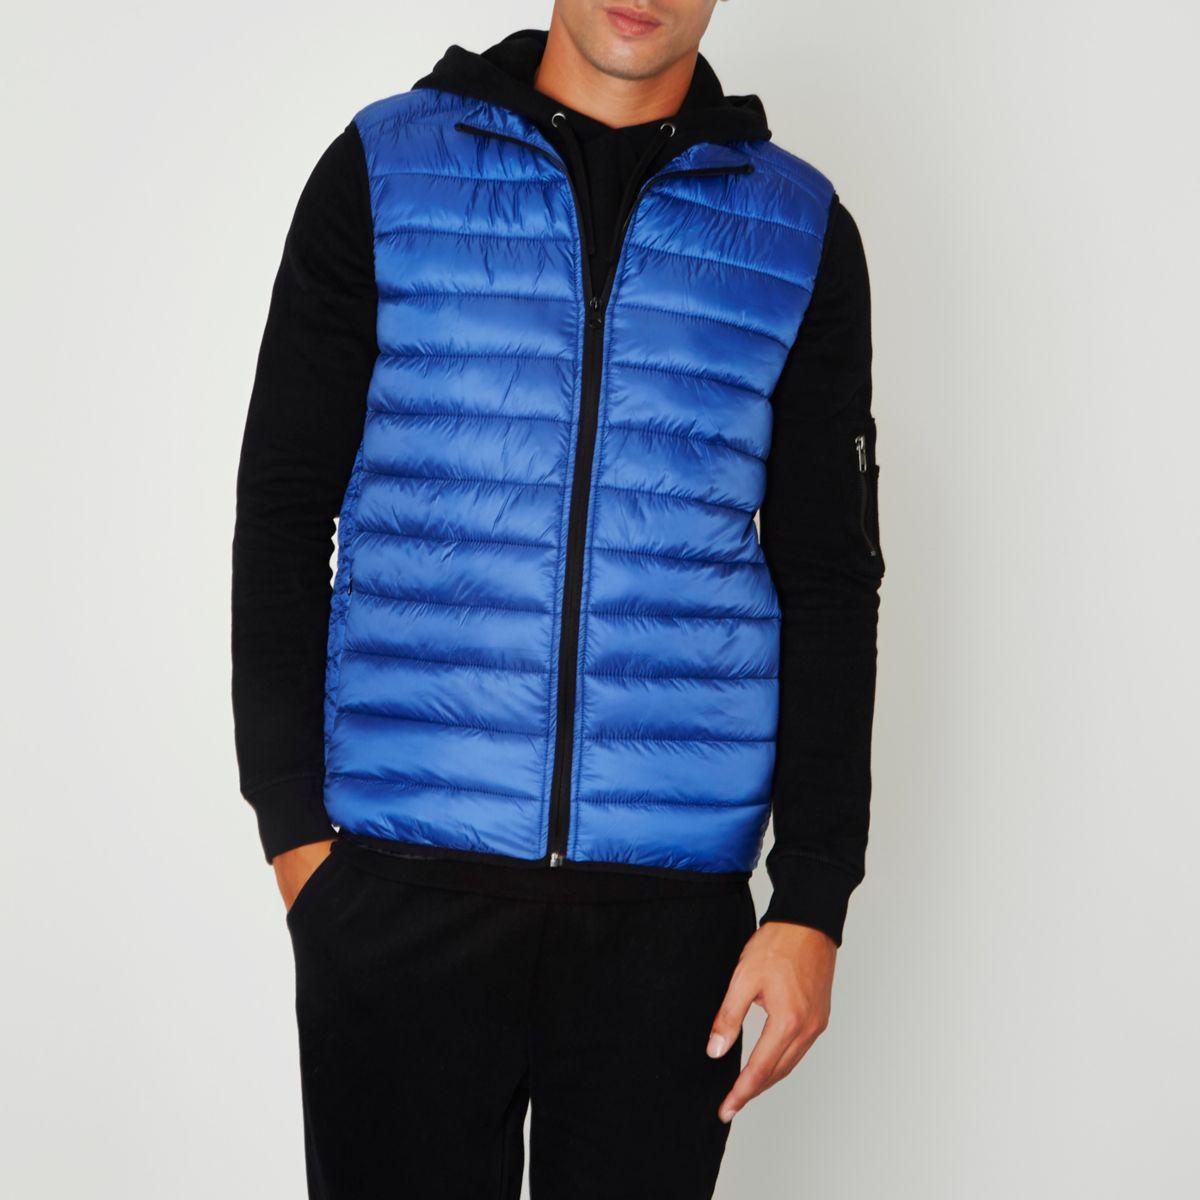 Blue puffer vest